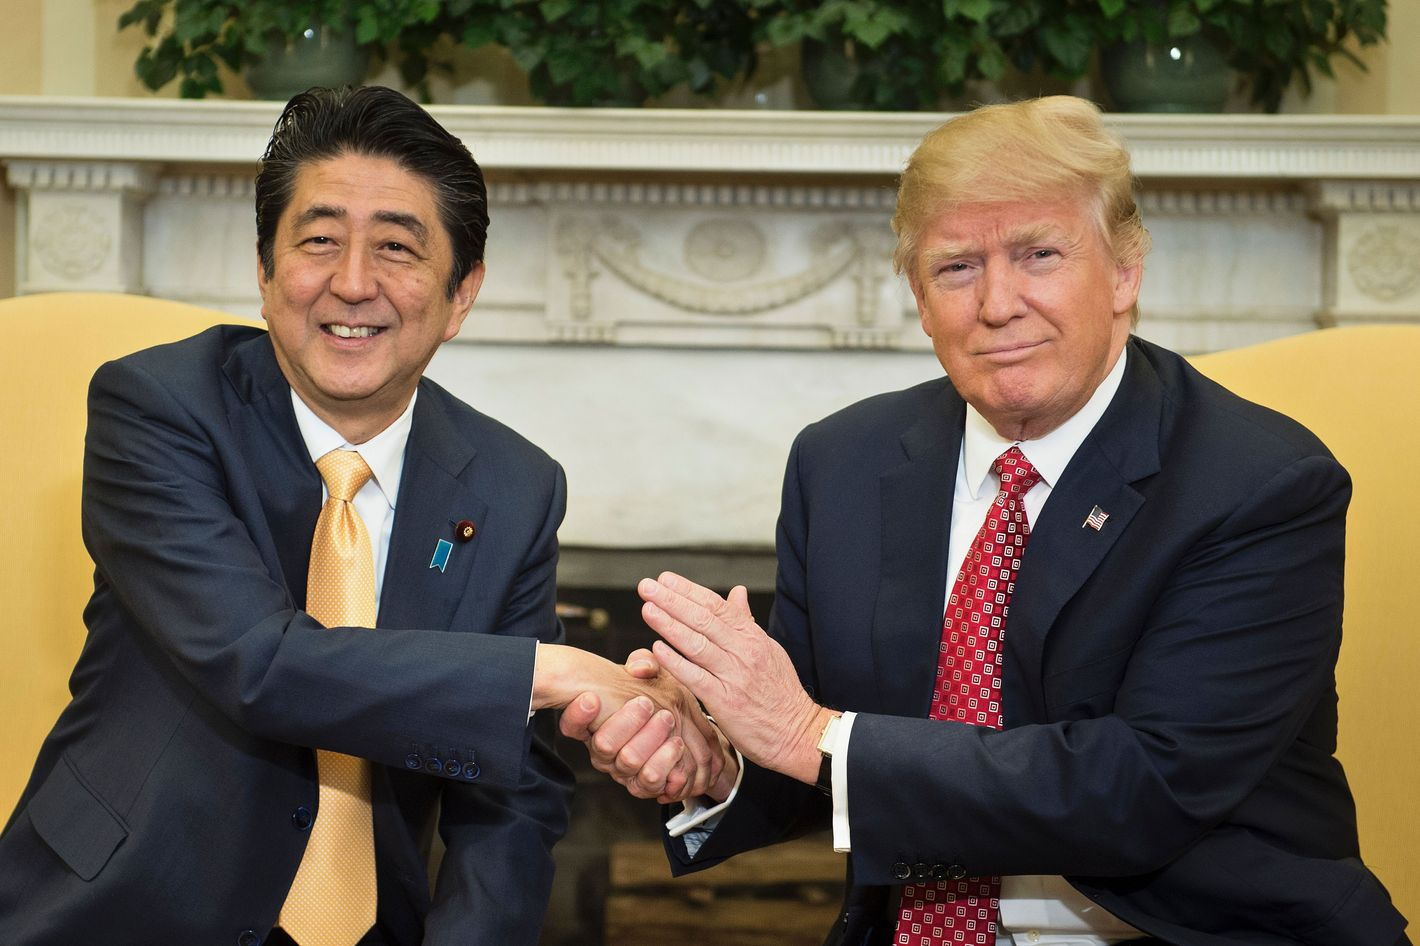 Donald Trump And Japan Pm Shinzo Abe Have Awkward Handshake